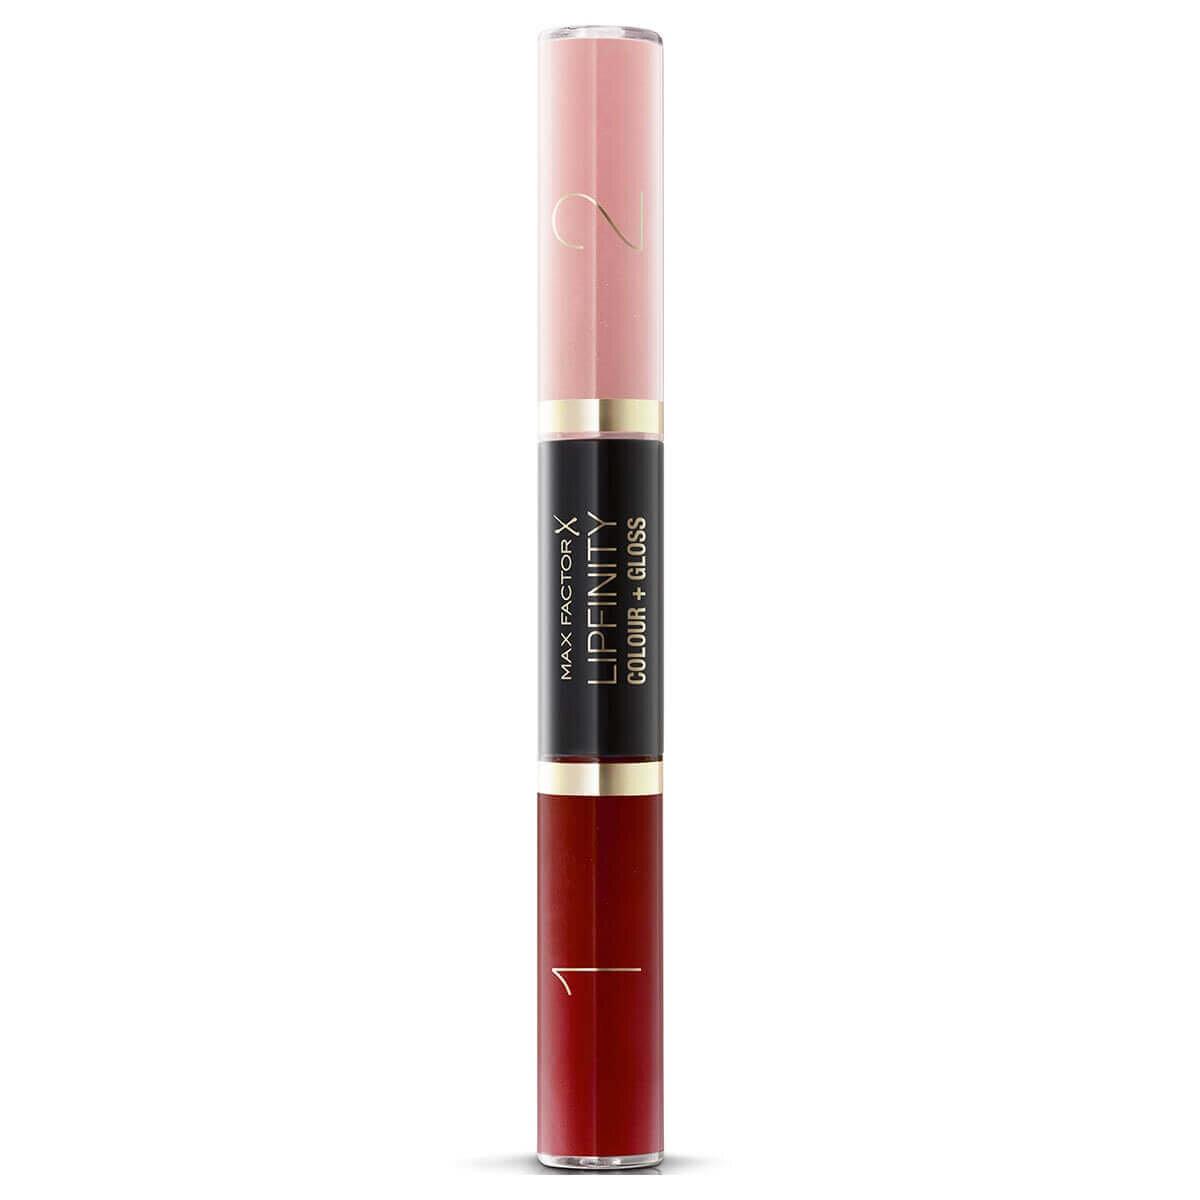 Lipfinity Lipgloss Ruj Color & Gloss No. 660